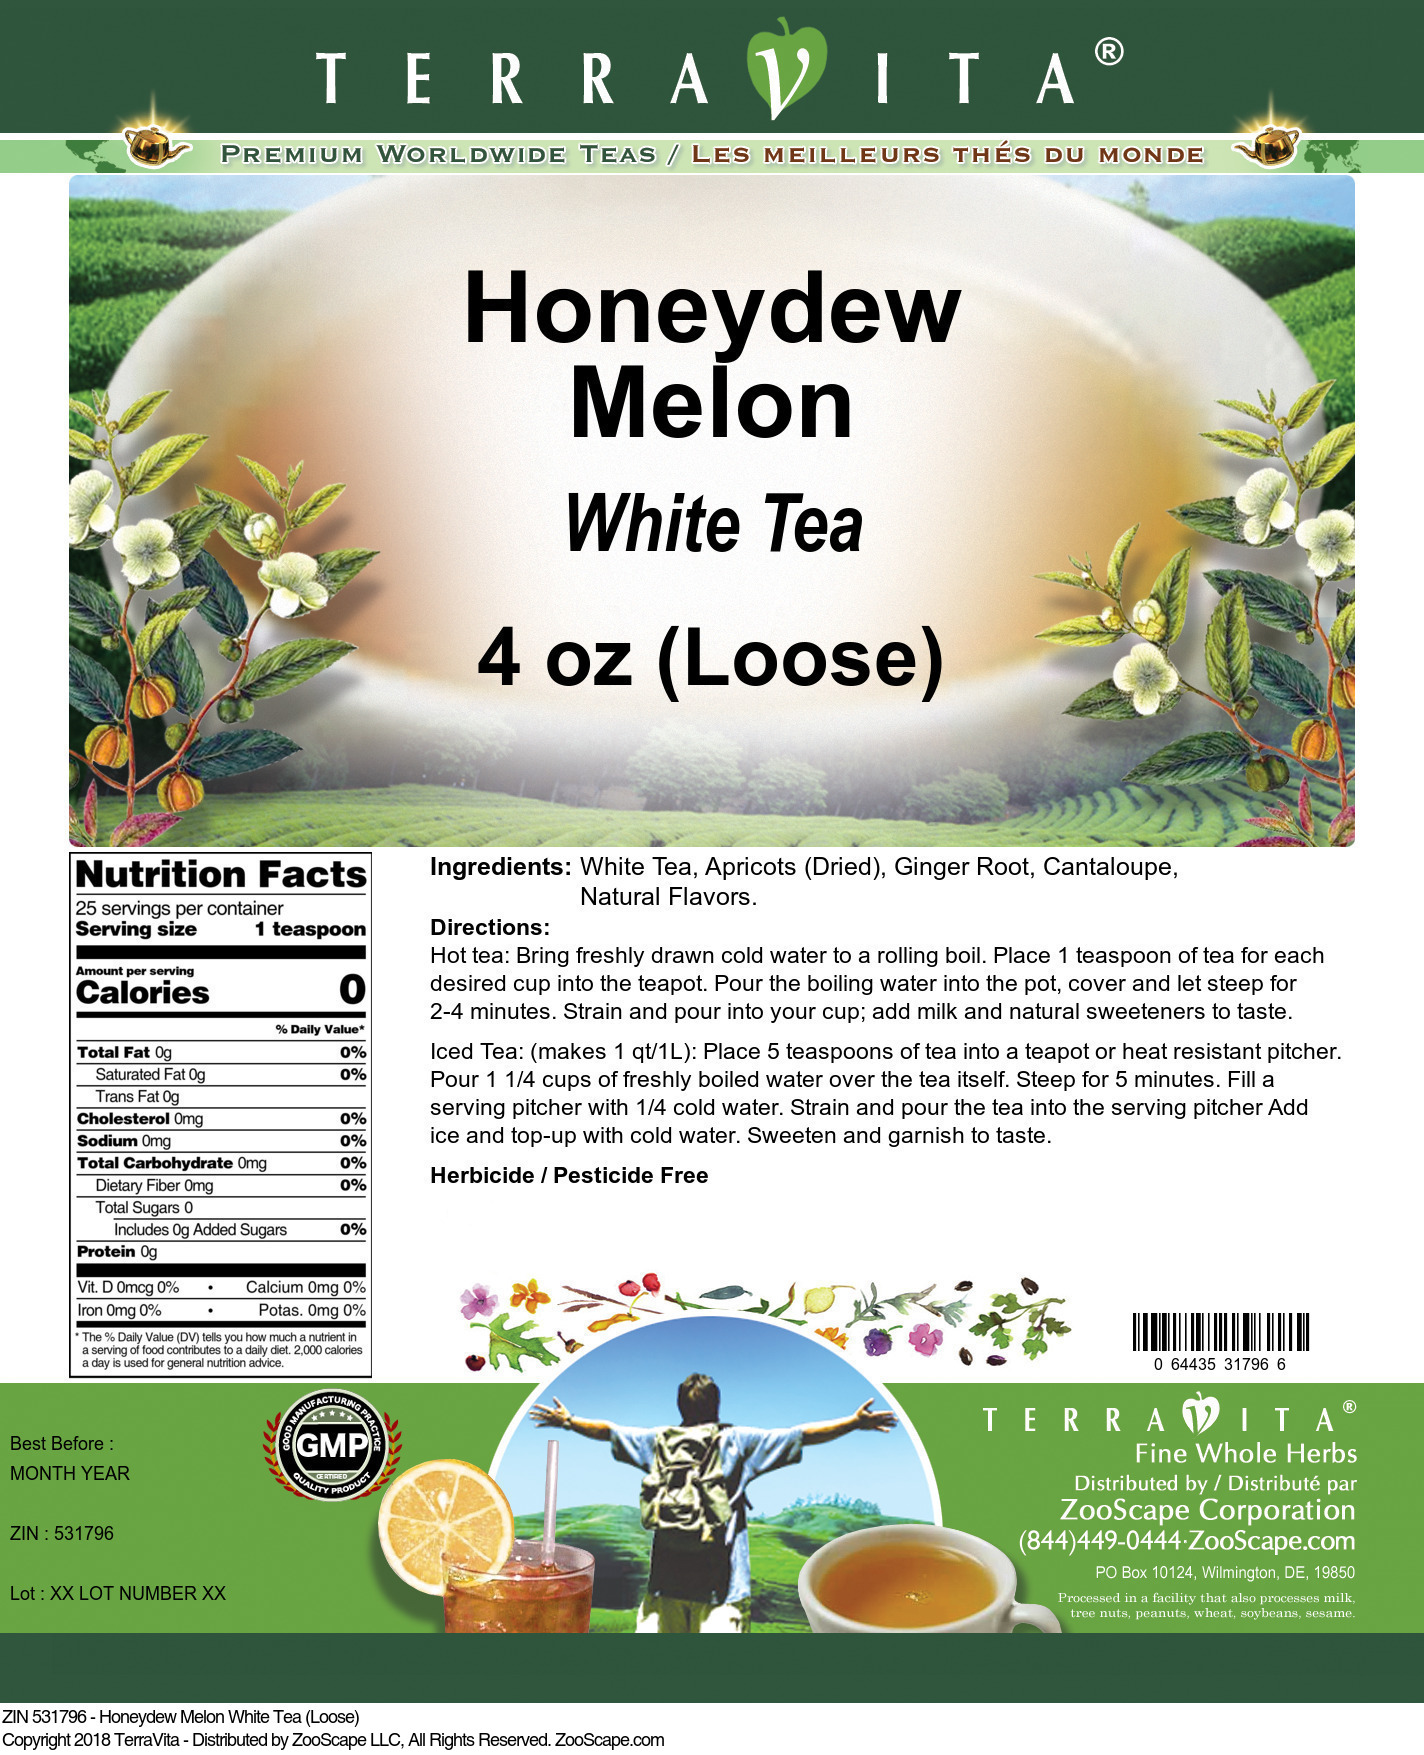 Honeydew Melon White Tea